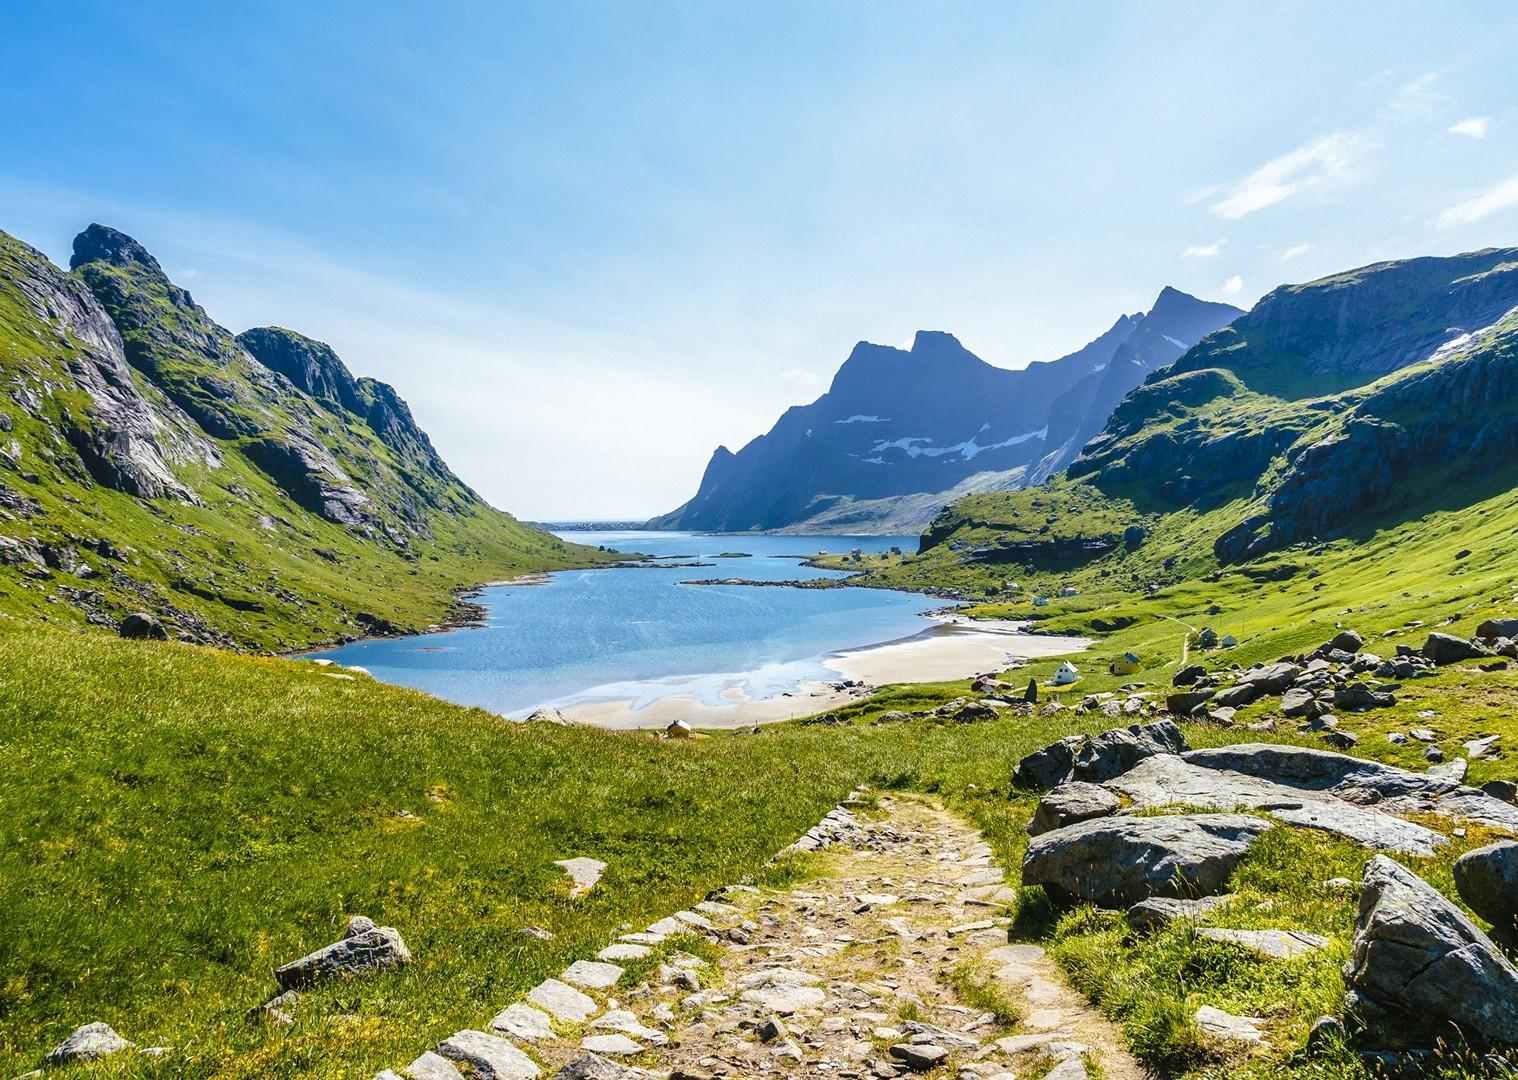 stunning-quiet-beaches-valleys-norway-cycling-relaxing-leisure.jpg - Norway - Lofoten Islands - Self-Guided Leisure Cycling Holiday - Leisure Cycling